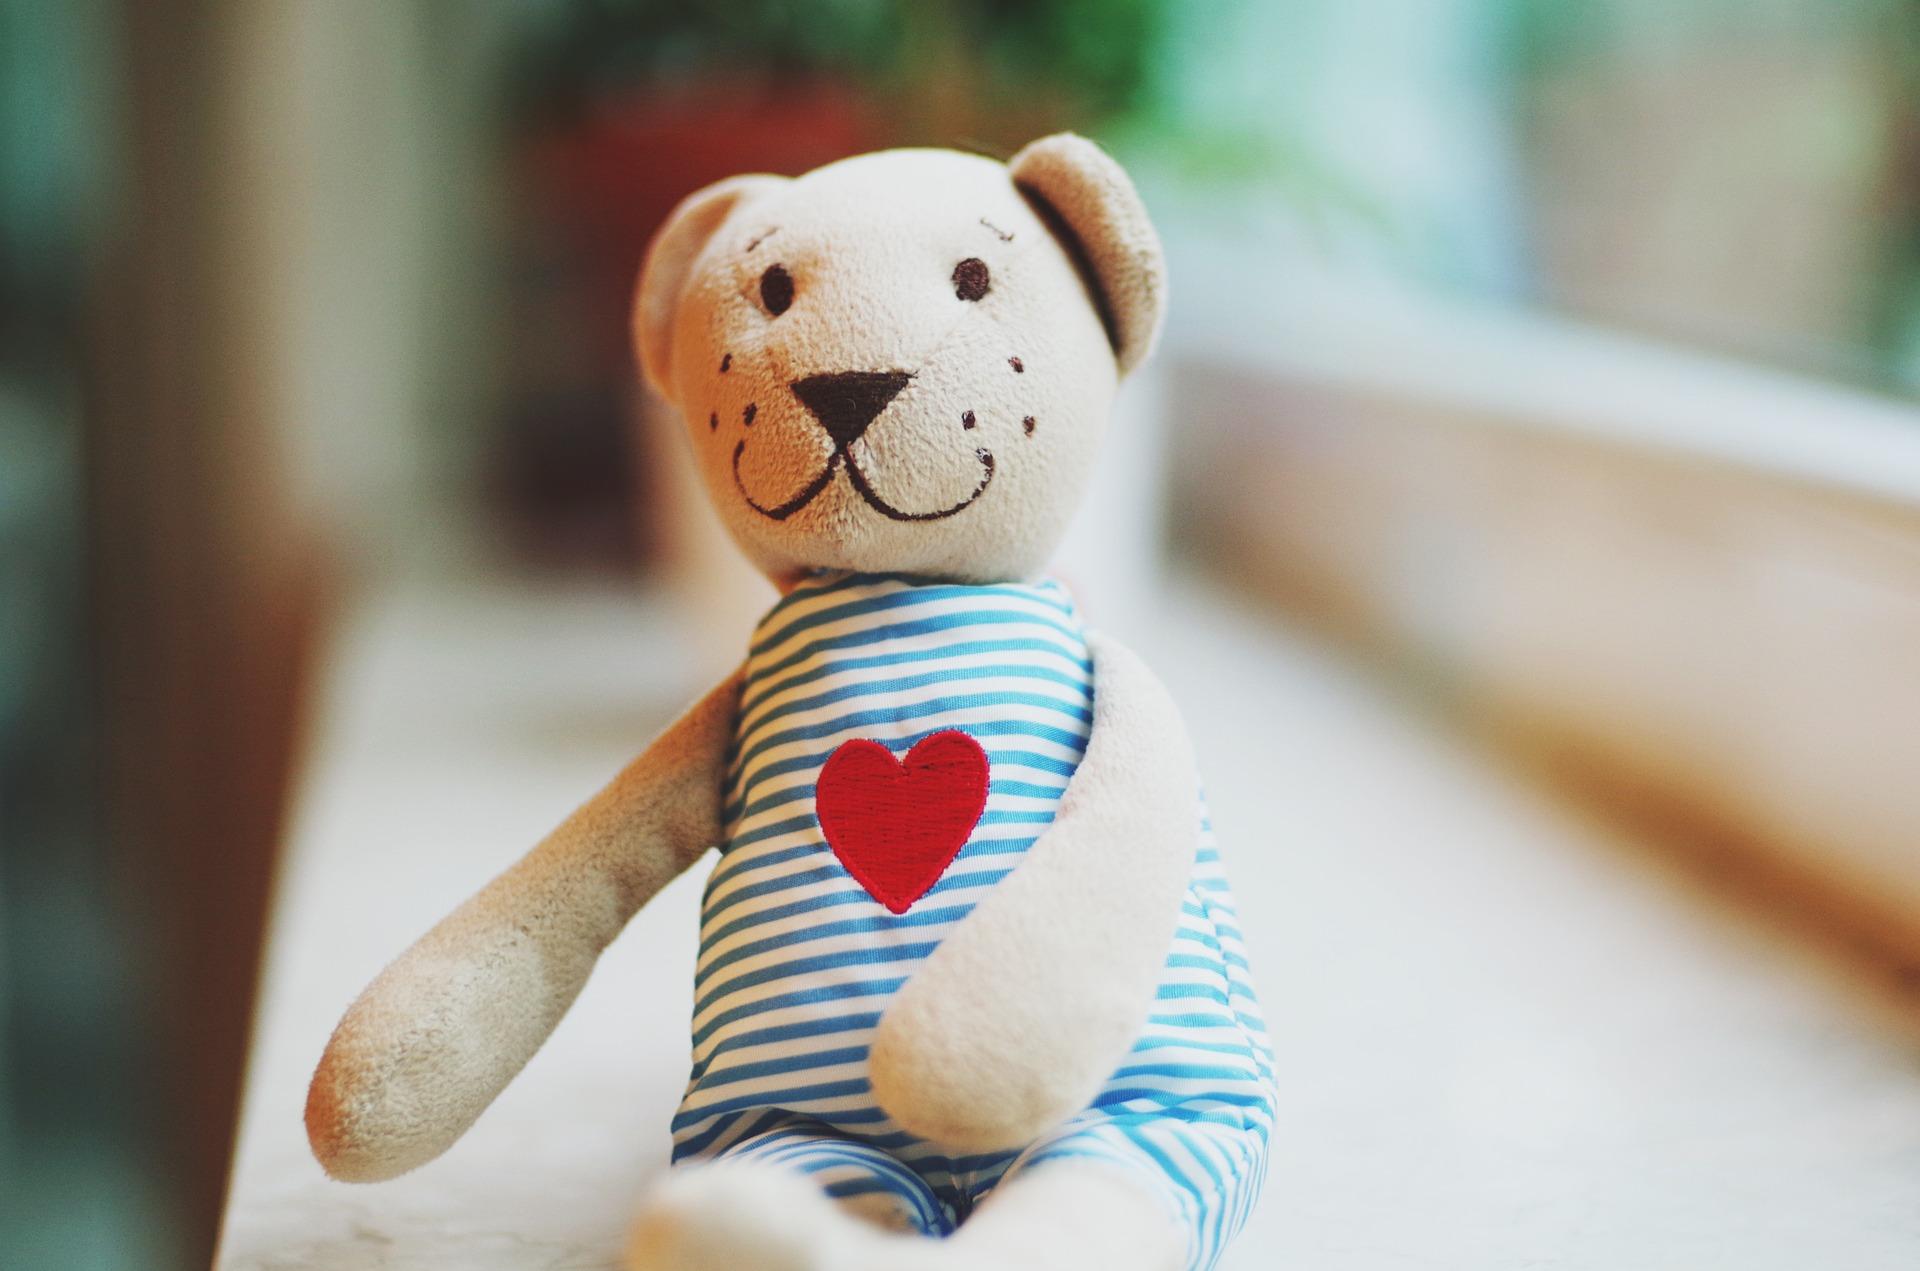 objeti-medvidek-jsem-dost-dobra-telo-a-duse-v-harmonii-pixabay